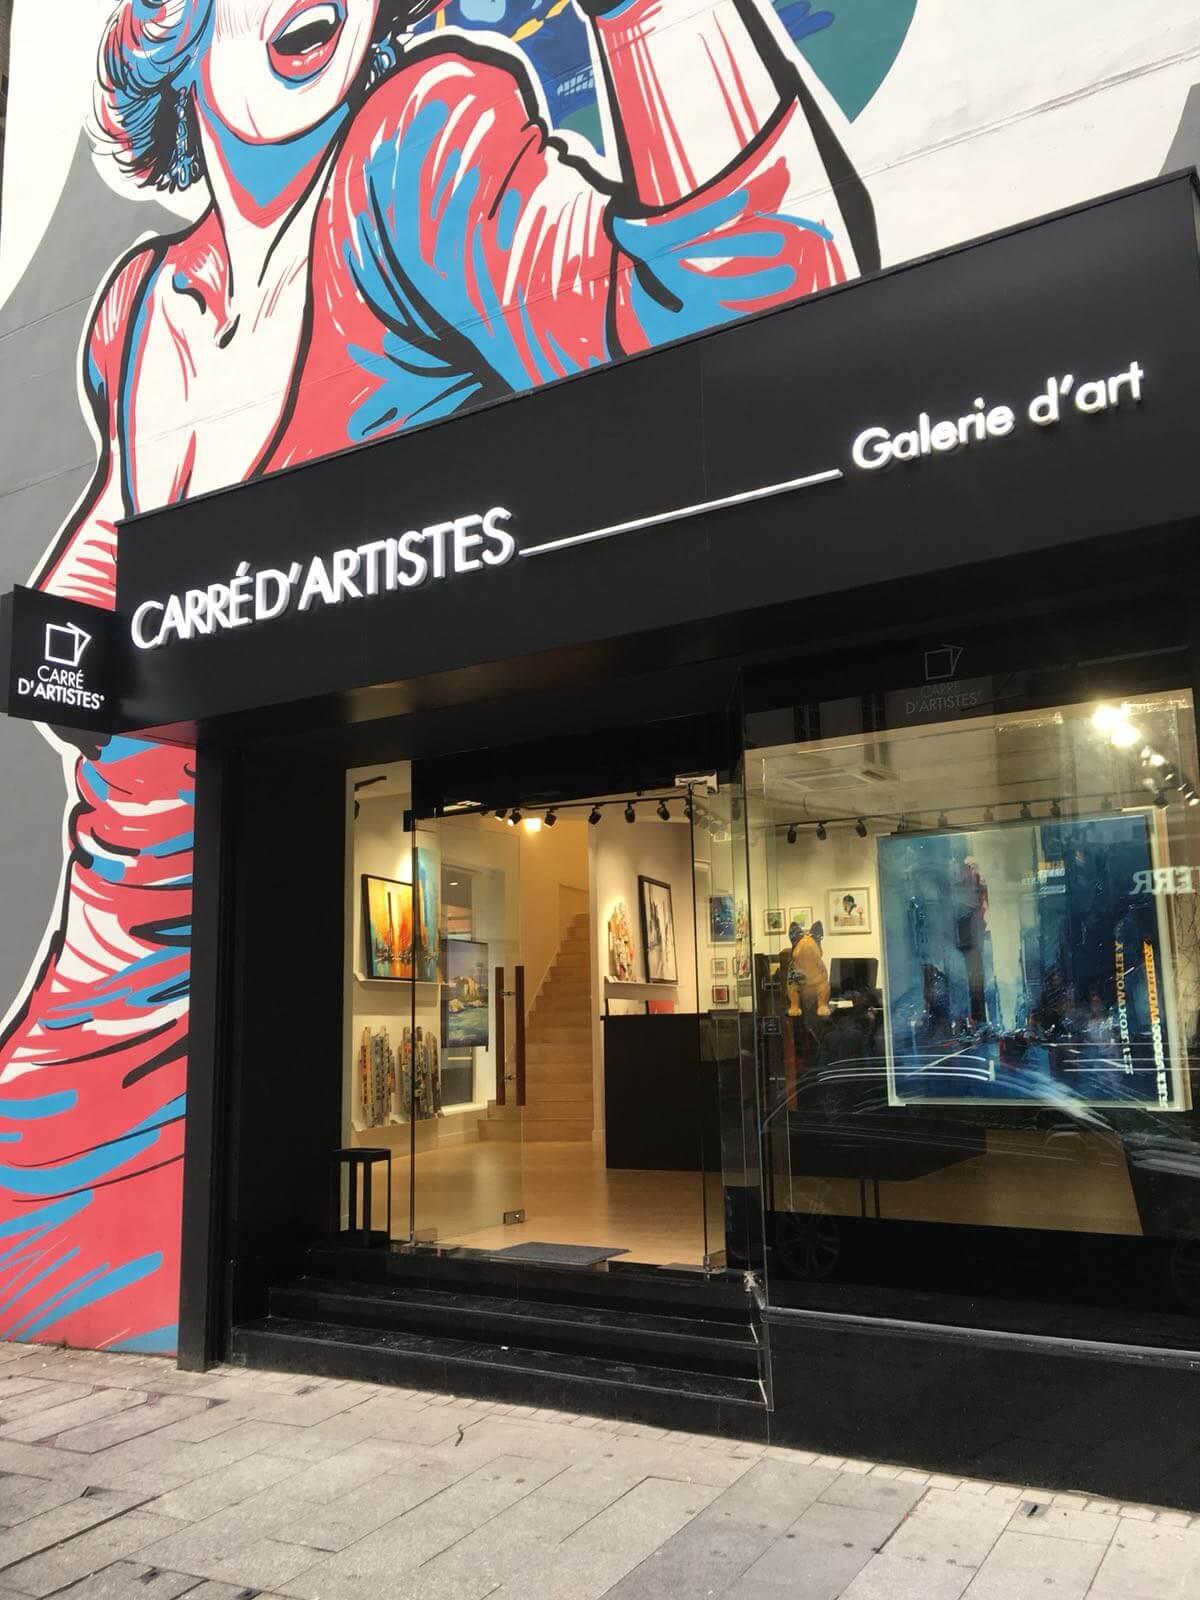 acheter de l'art dans la galerie d'art de carré d'artistes de hong kong